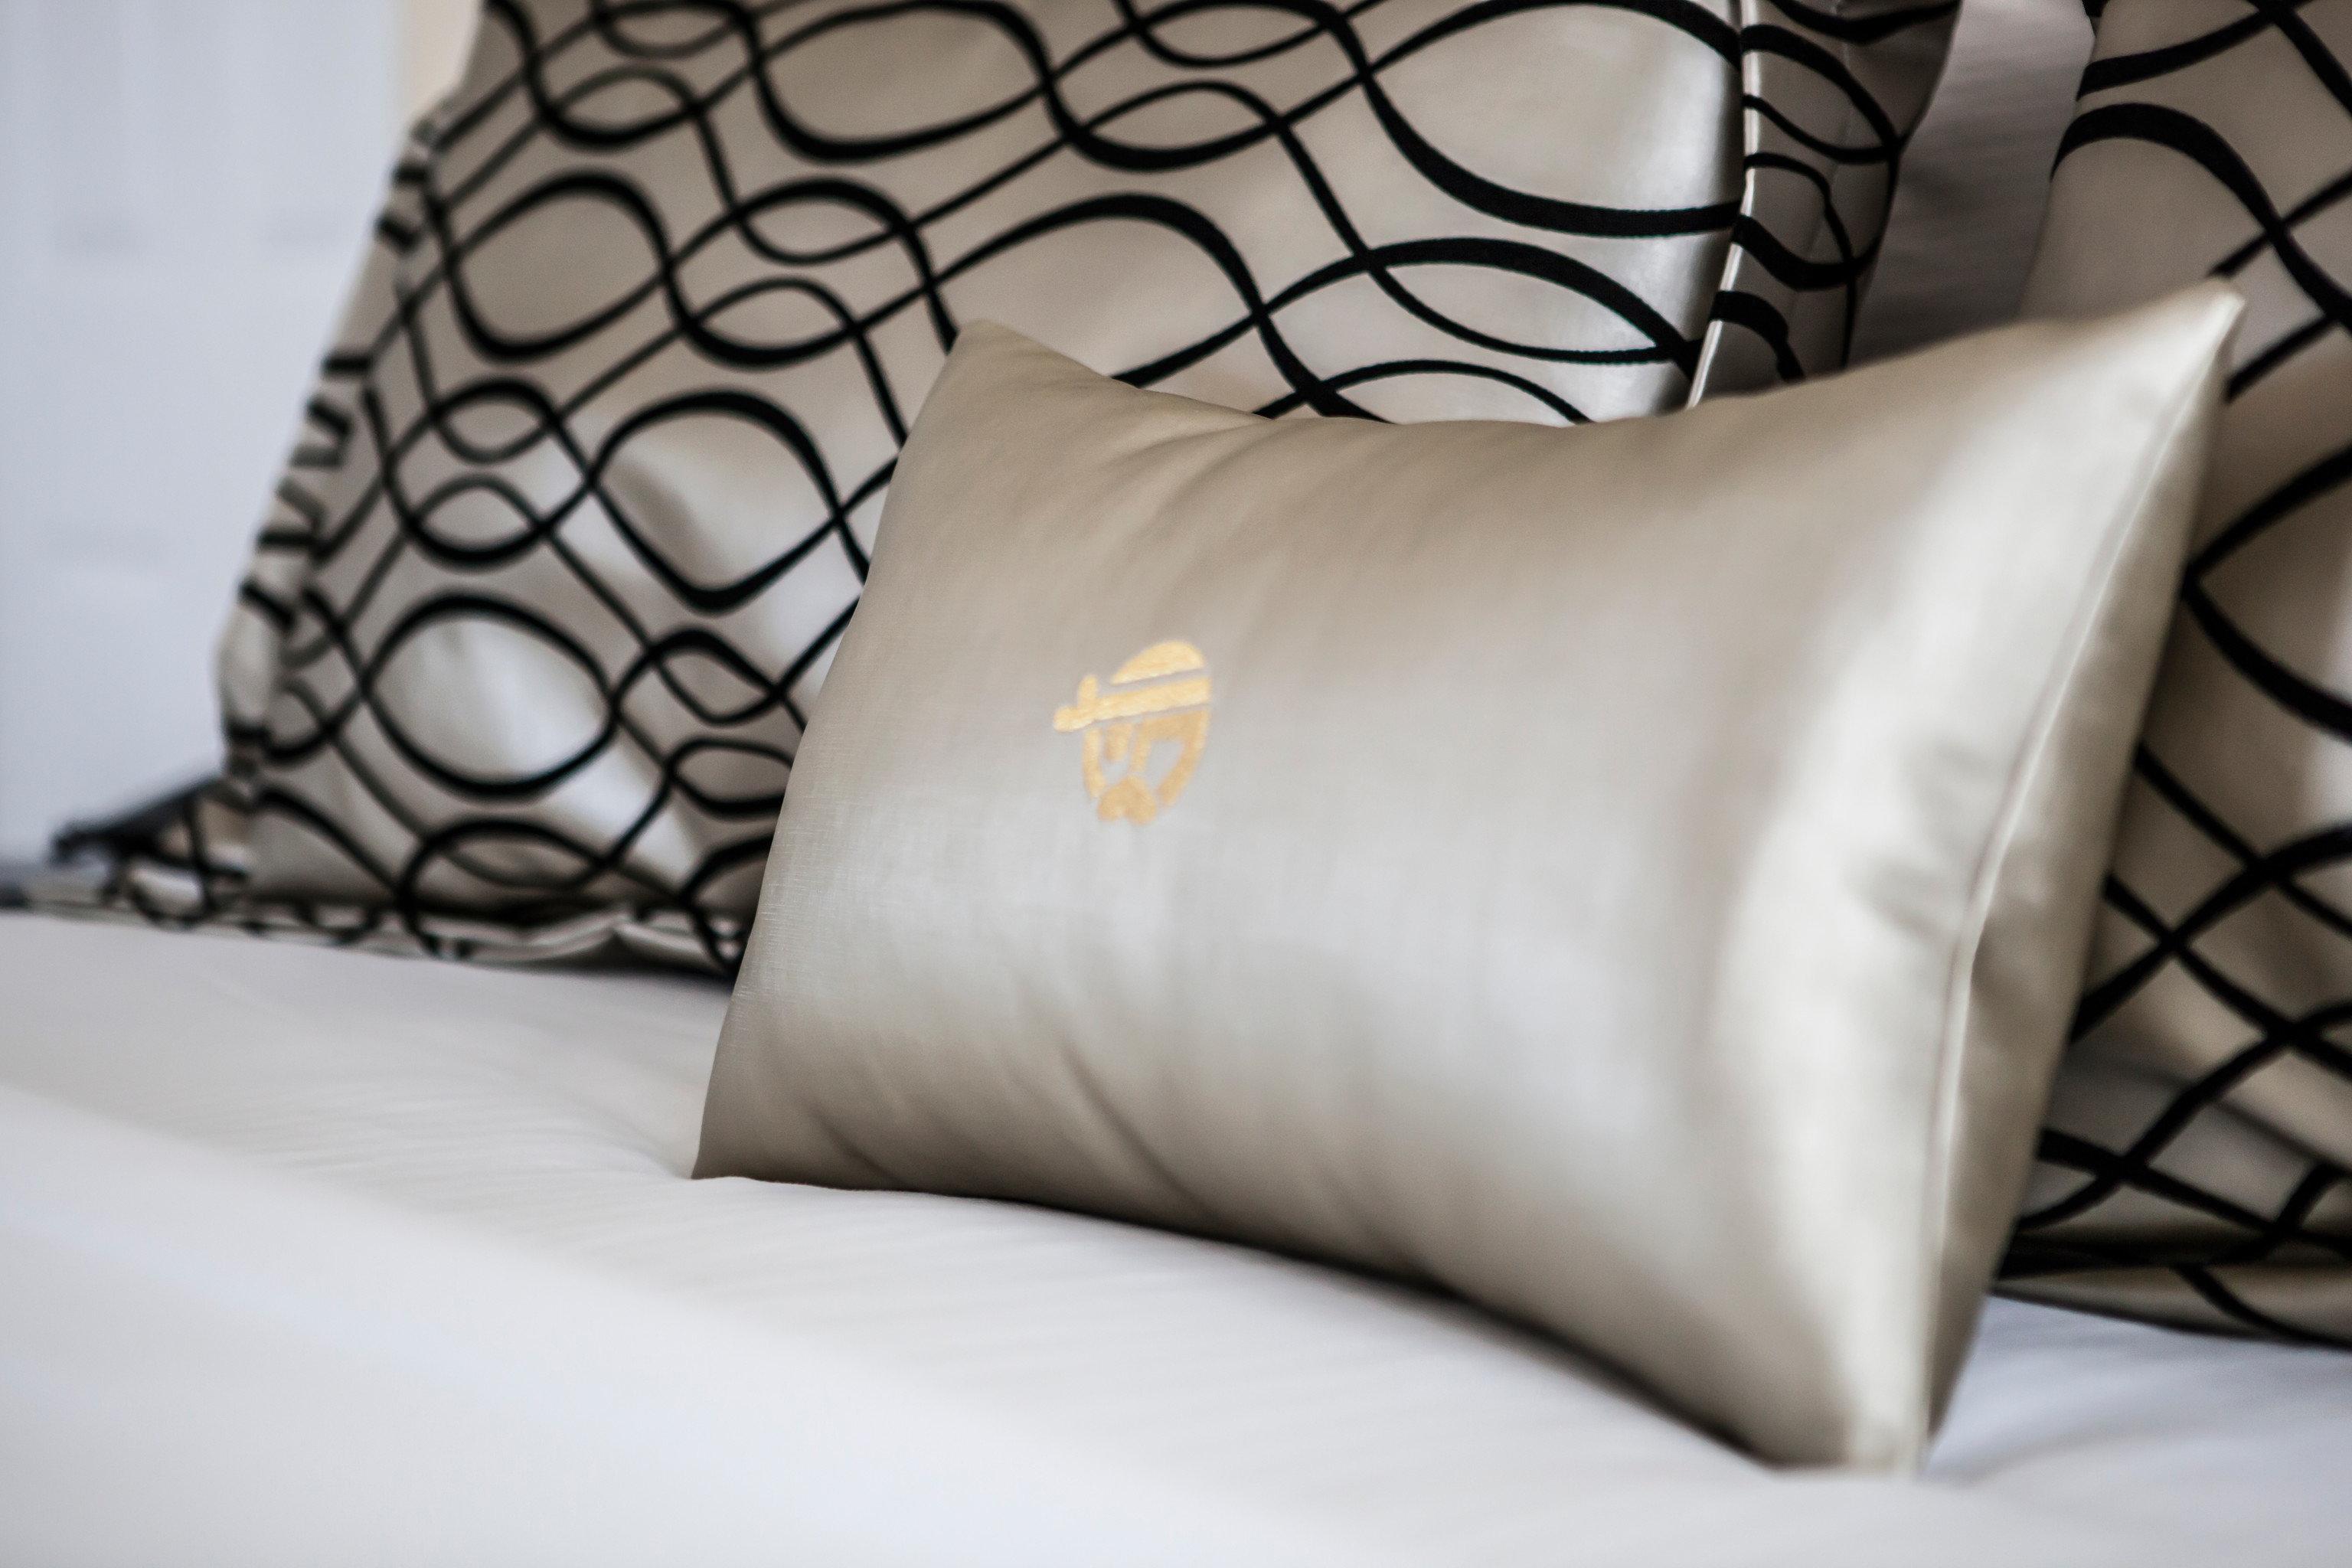 duvet cover pillow white bed sheet textile material pattern linens Bedroom lamp sofa